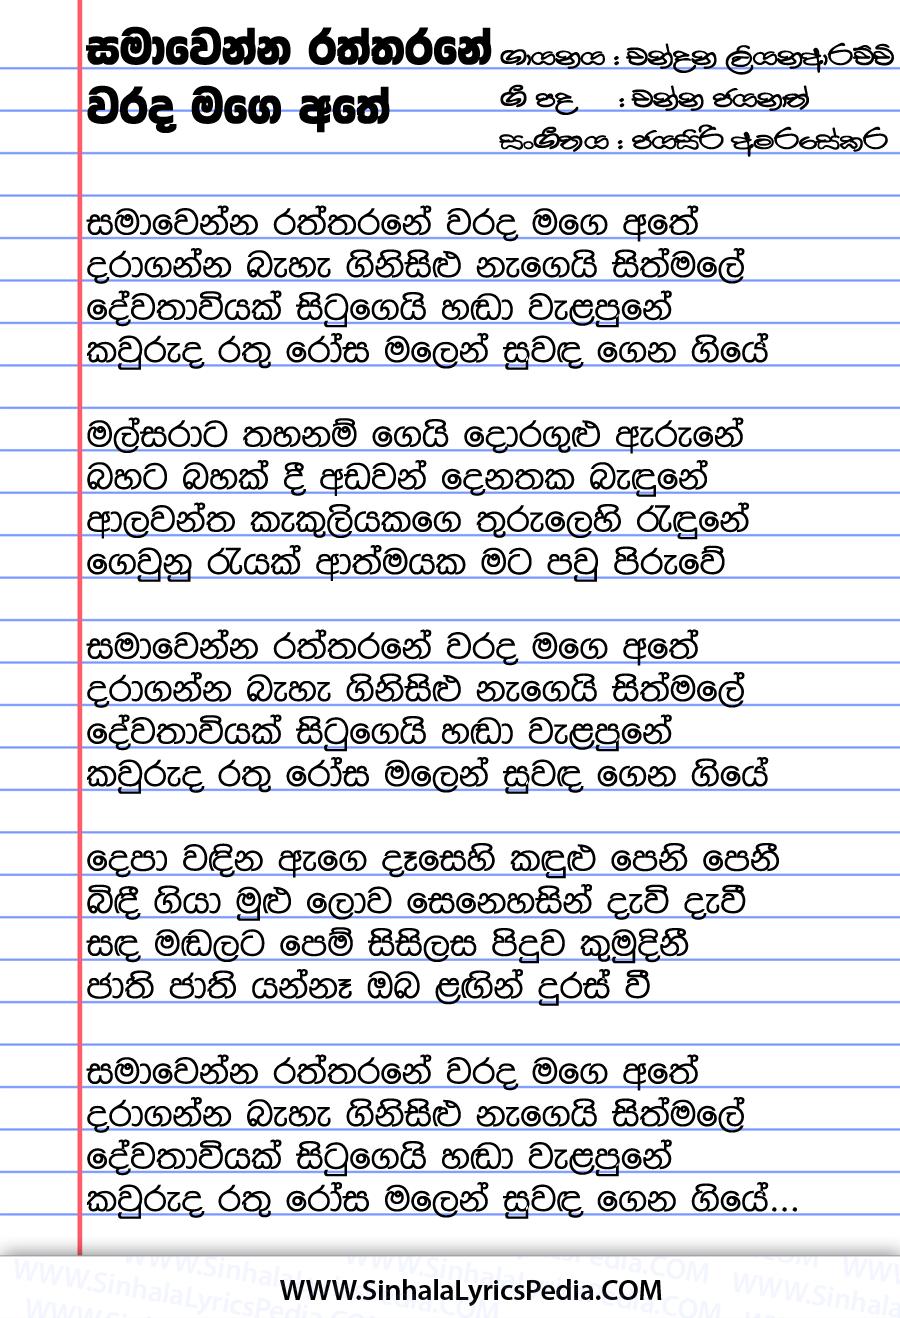 Samawenna Raththarane Warada Mage Athe Song Lyrics